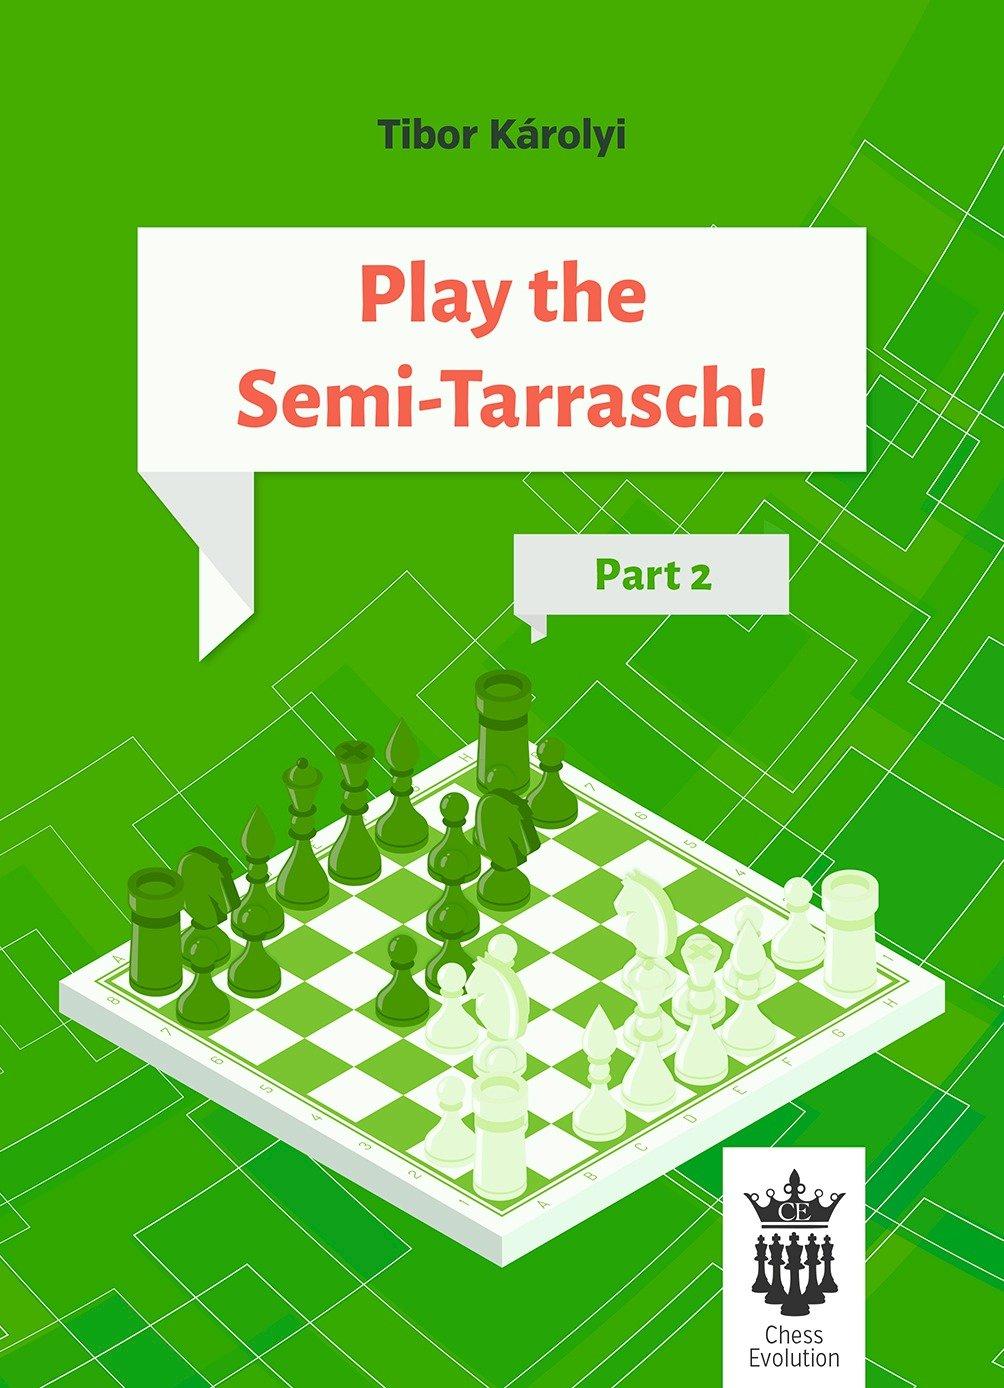 Tibor Karolyi_Play the Semi-Tarrasch Part 1 & 2 PDF+PGN_2018 GHBCLcXEgBQ